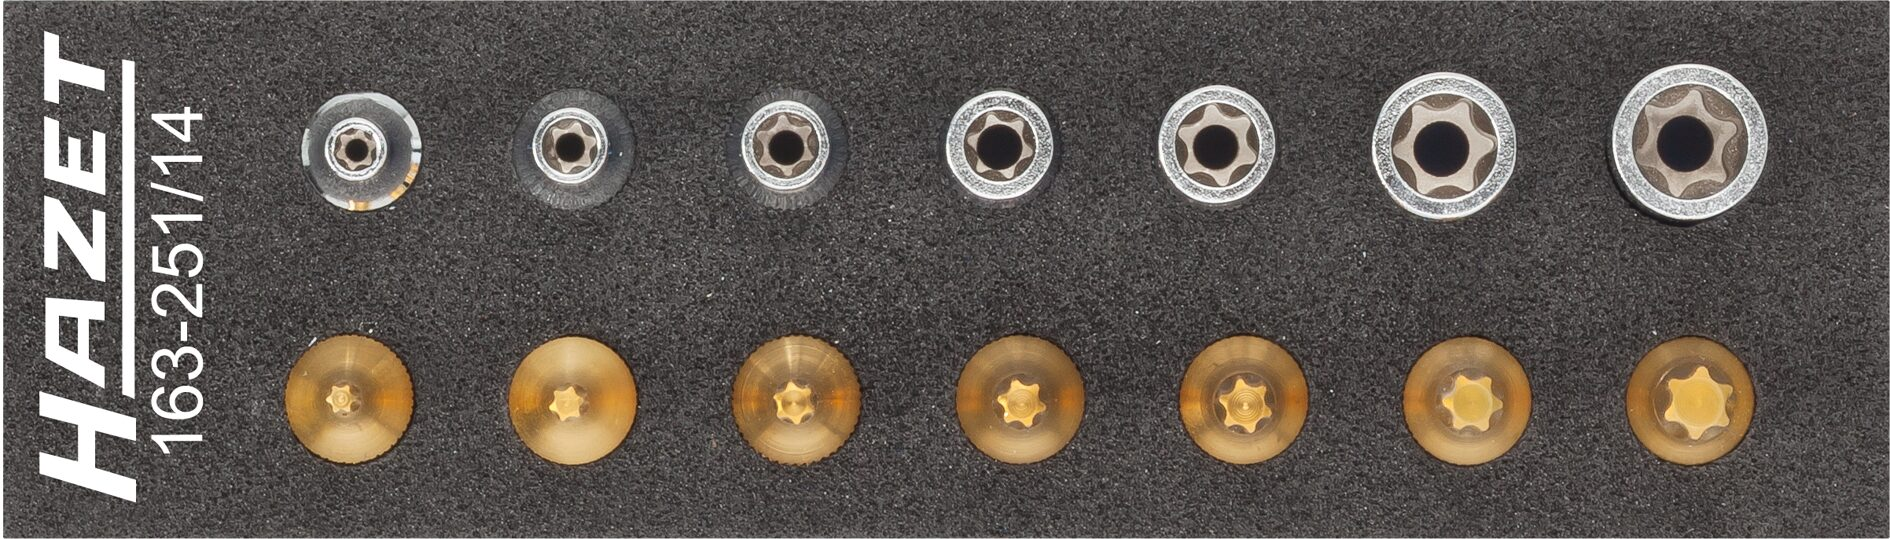 HAZET Werkzeug Satz ∙ TORX® 163-251/14 ∙ Vierkant hohl 6,3 mm (1/4 Zoll) ∙ Außen TORX® Profil, Innen TORX® Profil